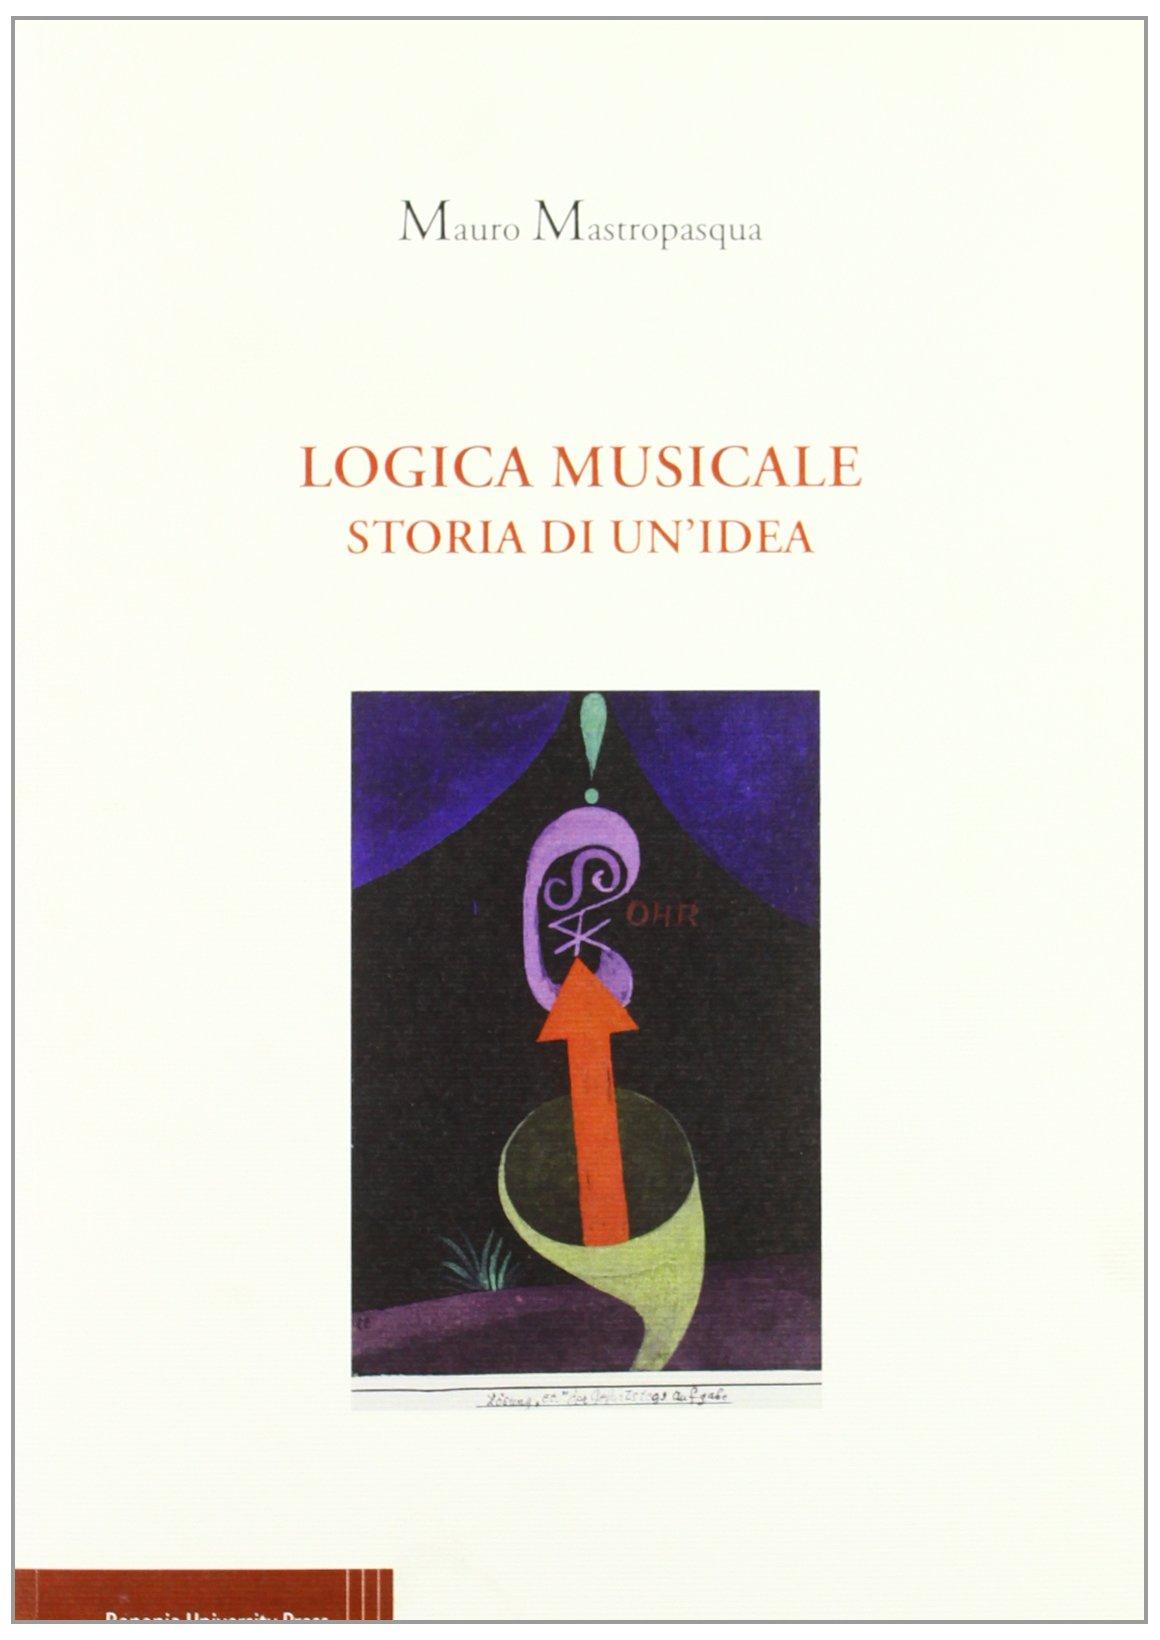 Logica musicale